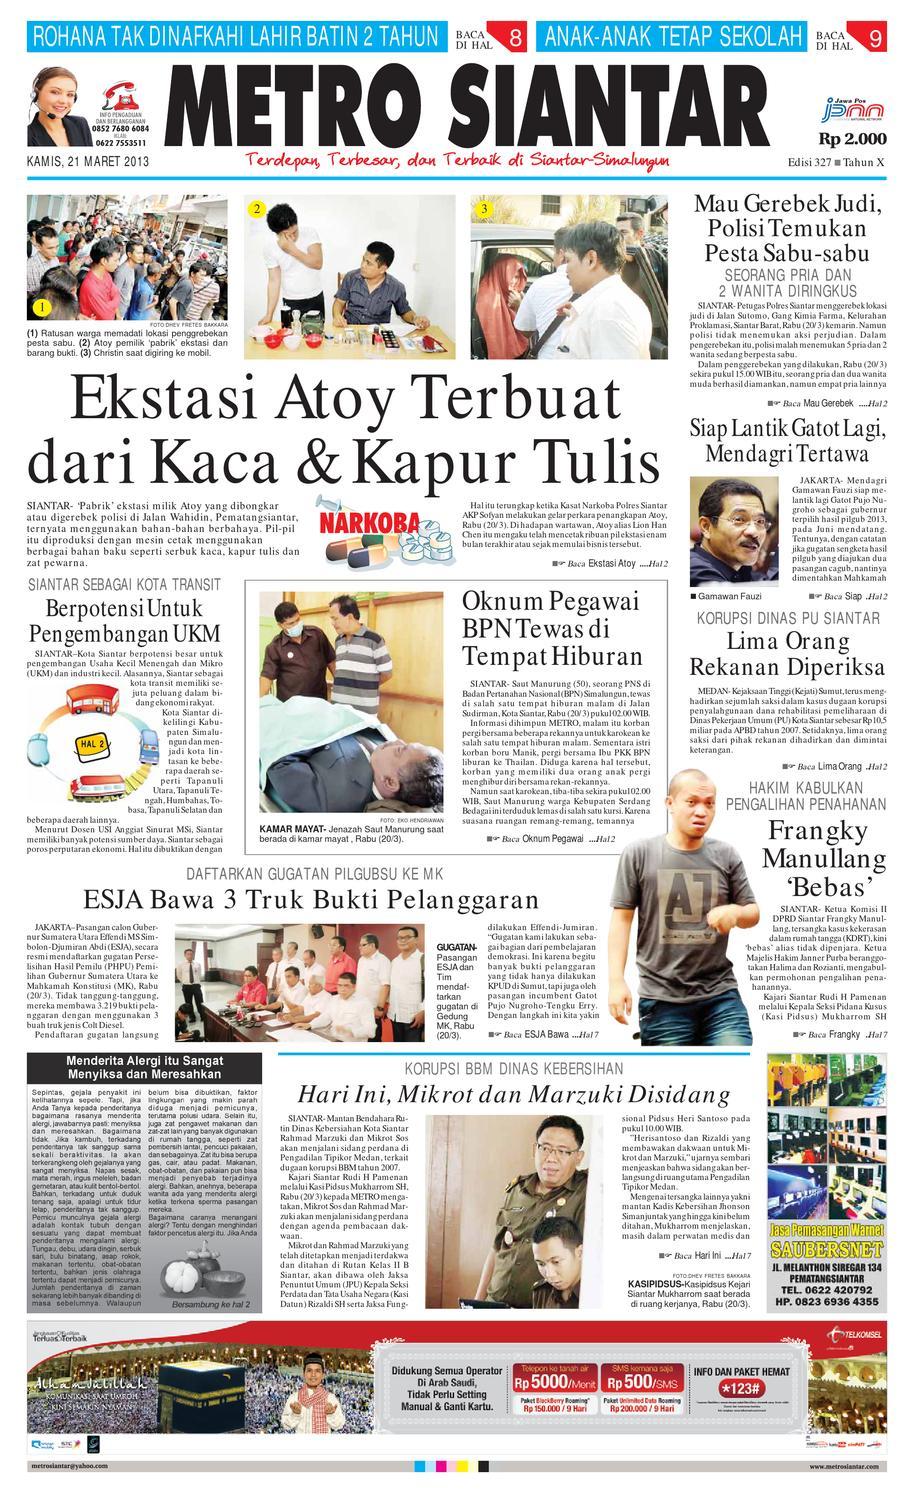 Epaper Metro Siantar Online By Issuu Produk Ukm Bumn Jamu Instan Abah Aromahtrenggalek